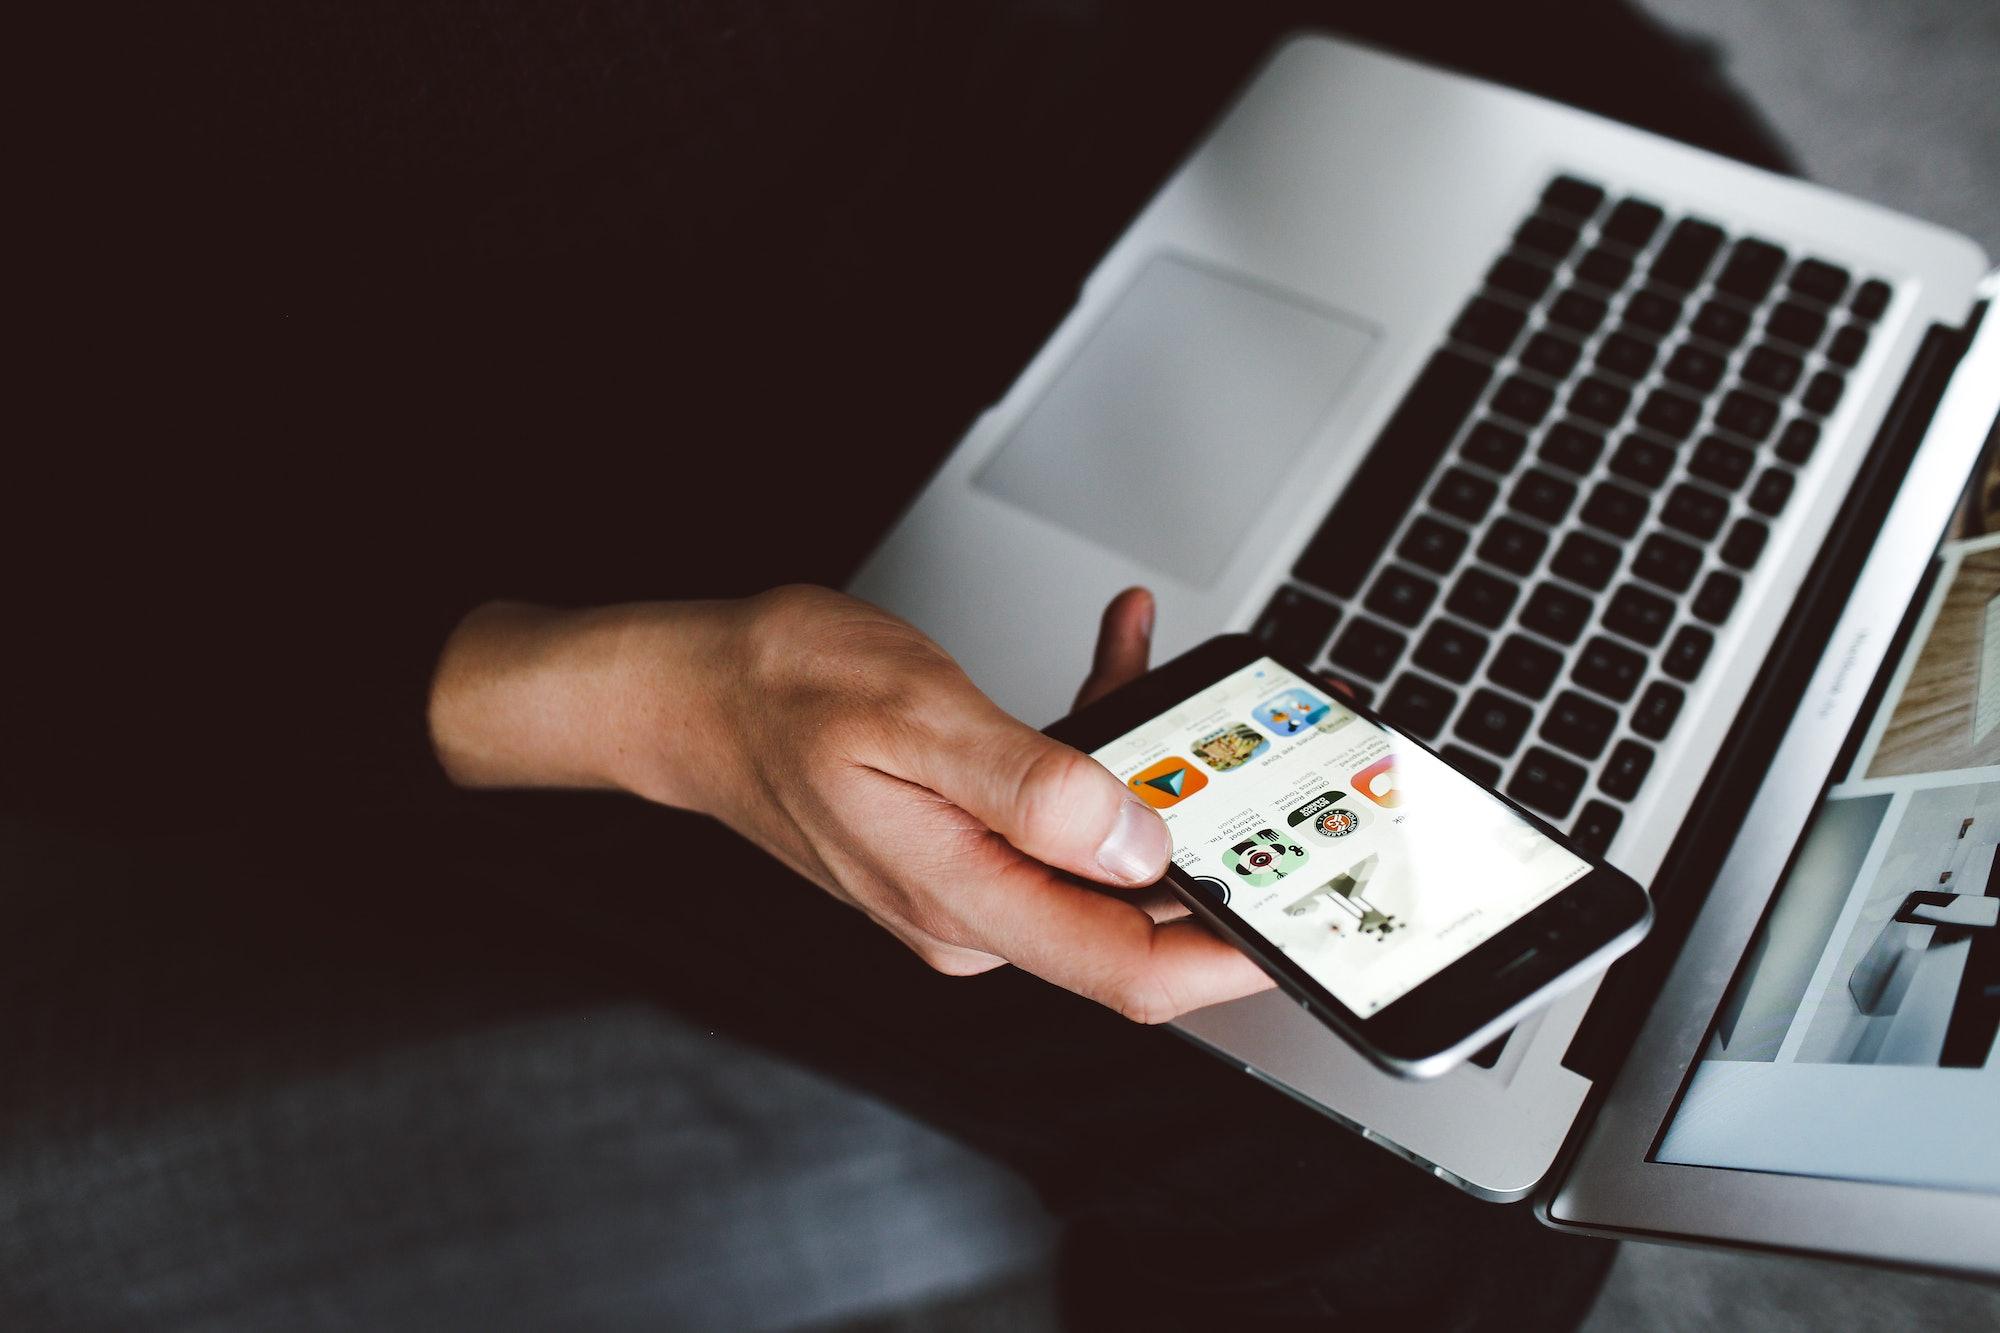 iPhone and MacBook.